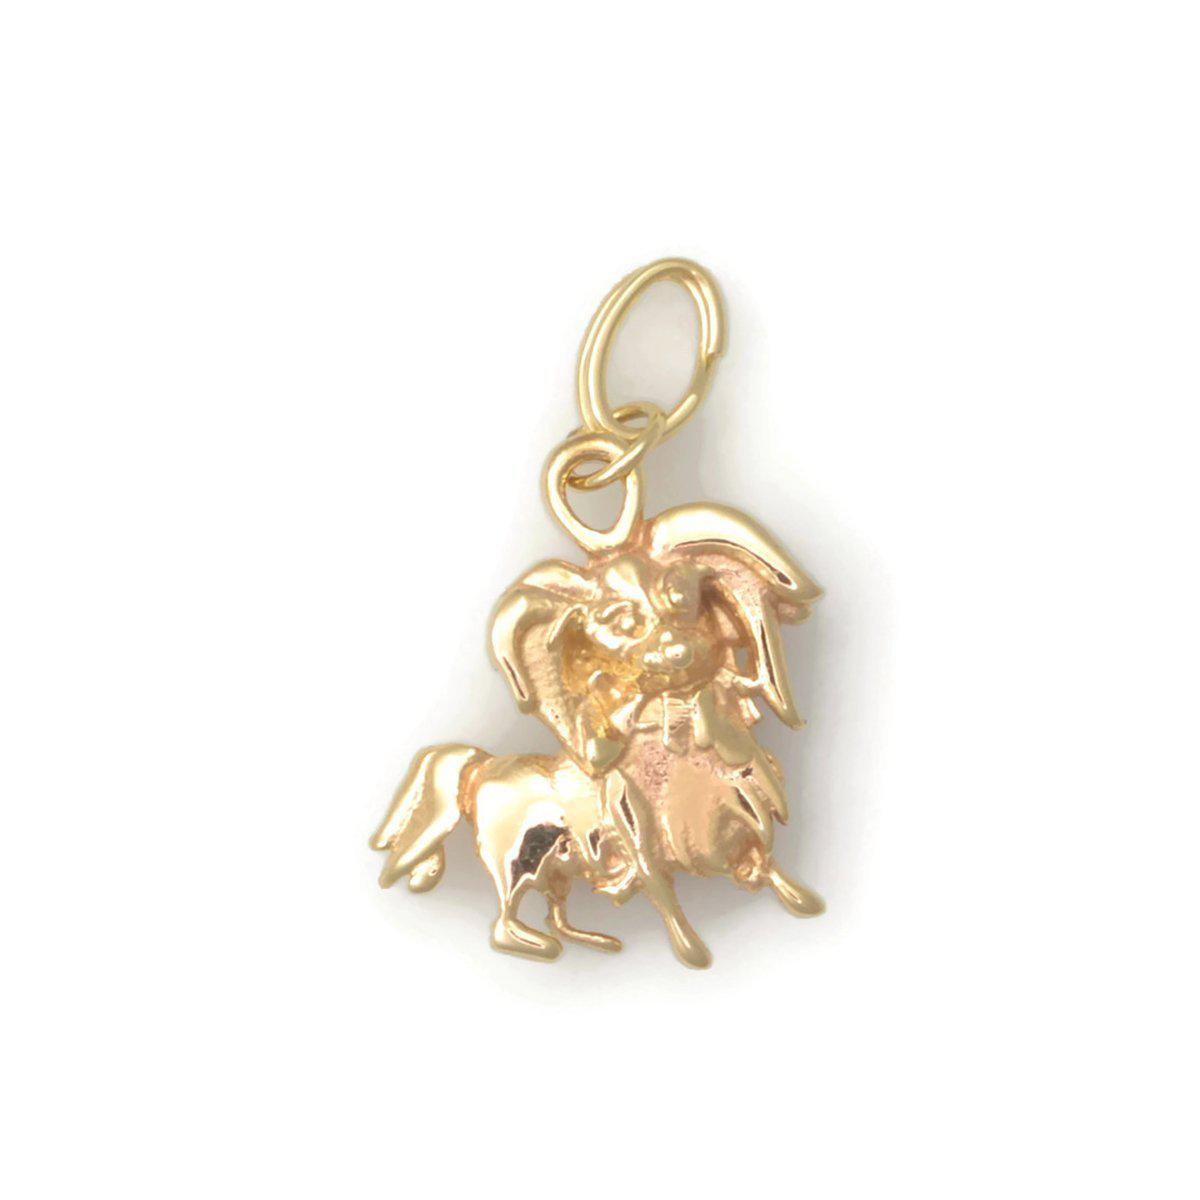 Donna Pizarro Designs 14kt Yellow Gold Papillion Charm yxvTs3g